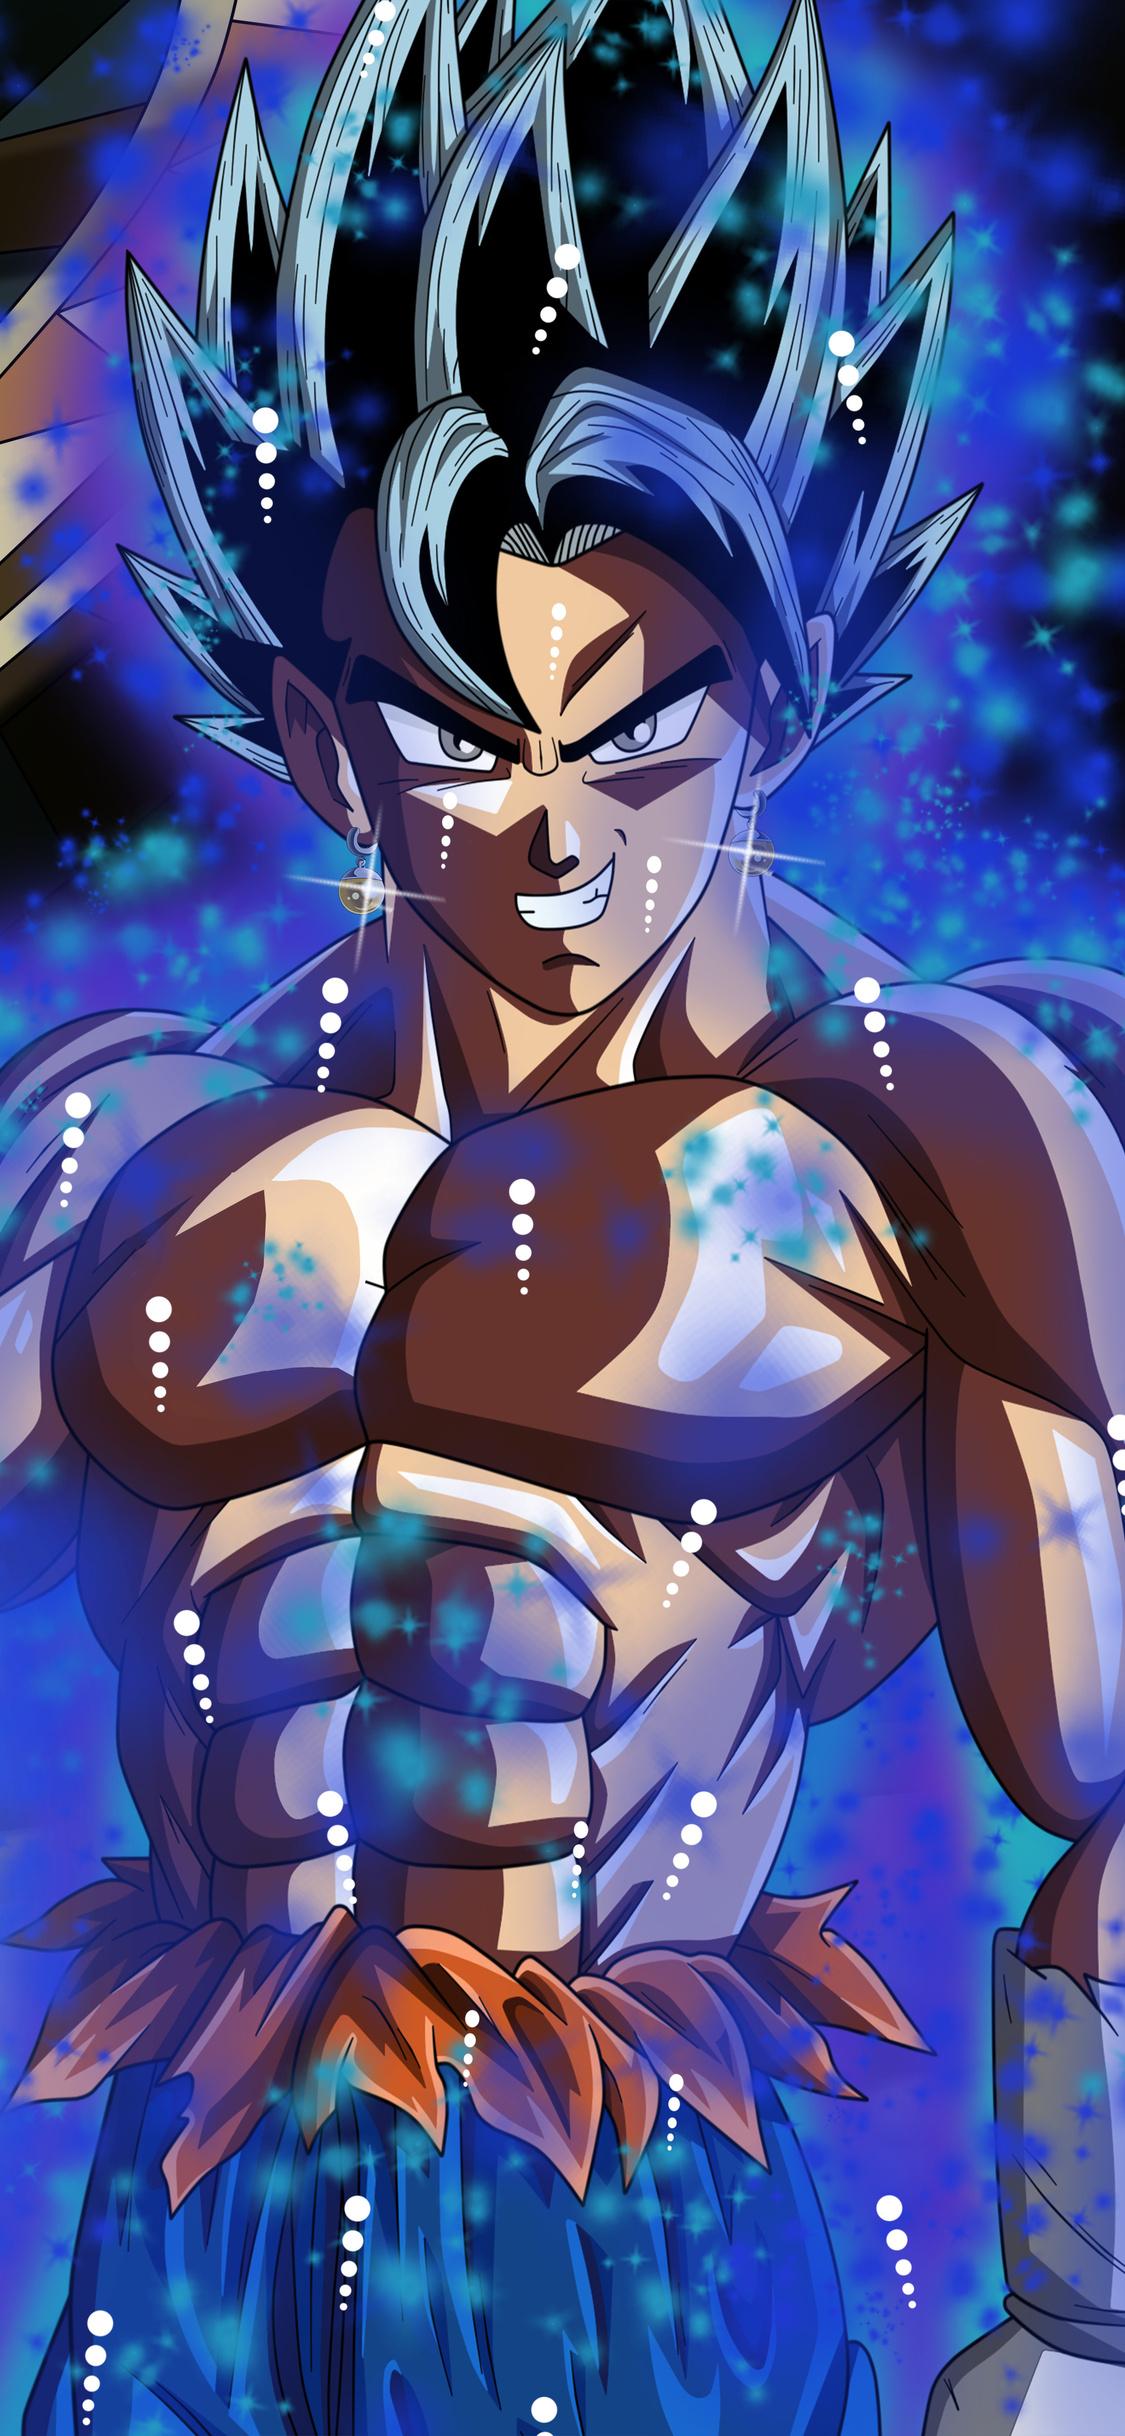 1125x2436 Goku Dragon Ball Super 8k Iphone XS,Iphone 10,Iphone X HD 4k Wallpapers, Images